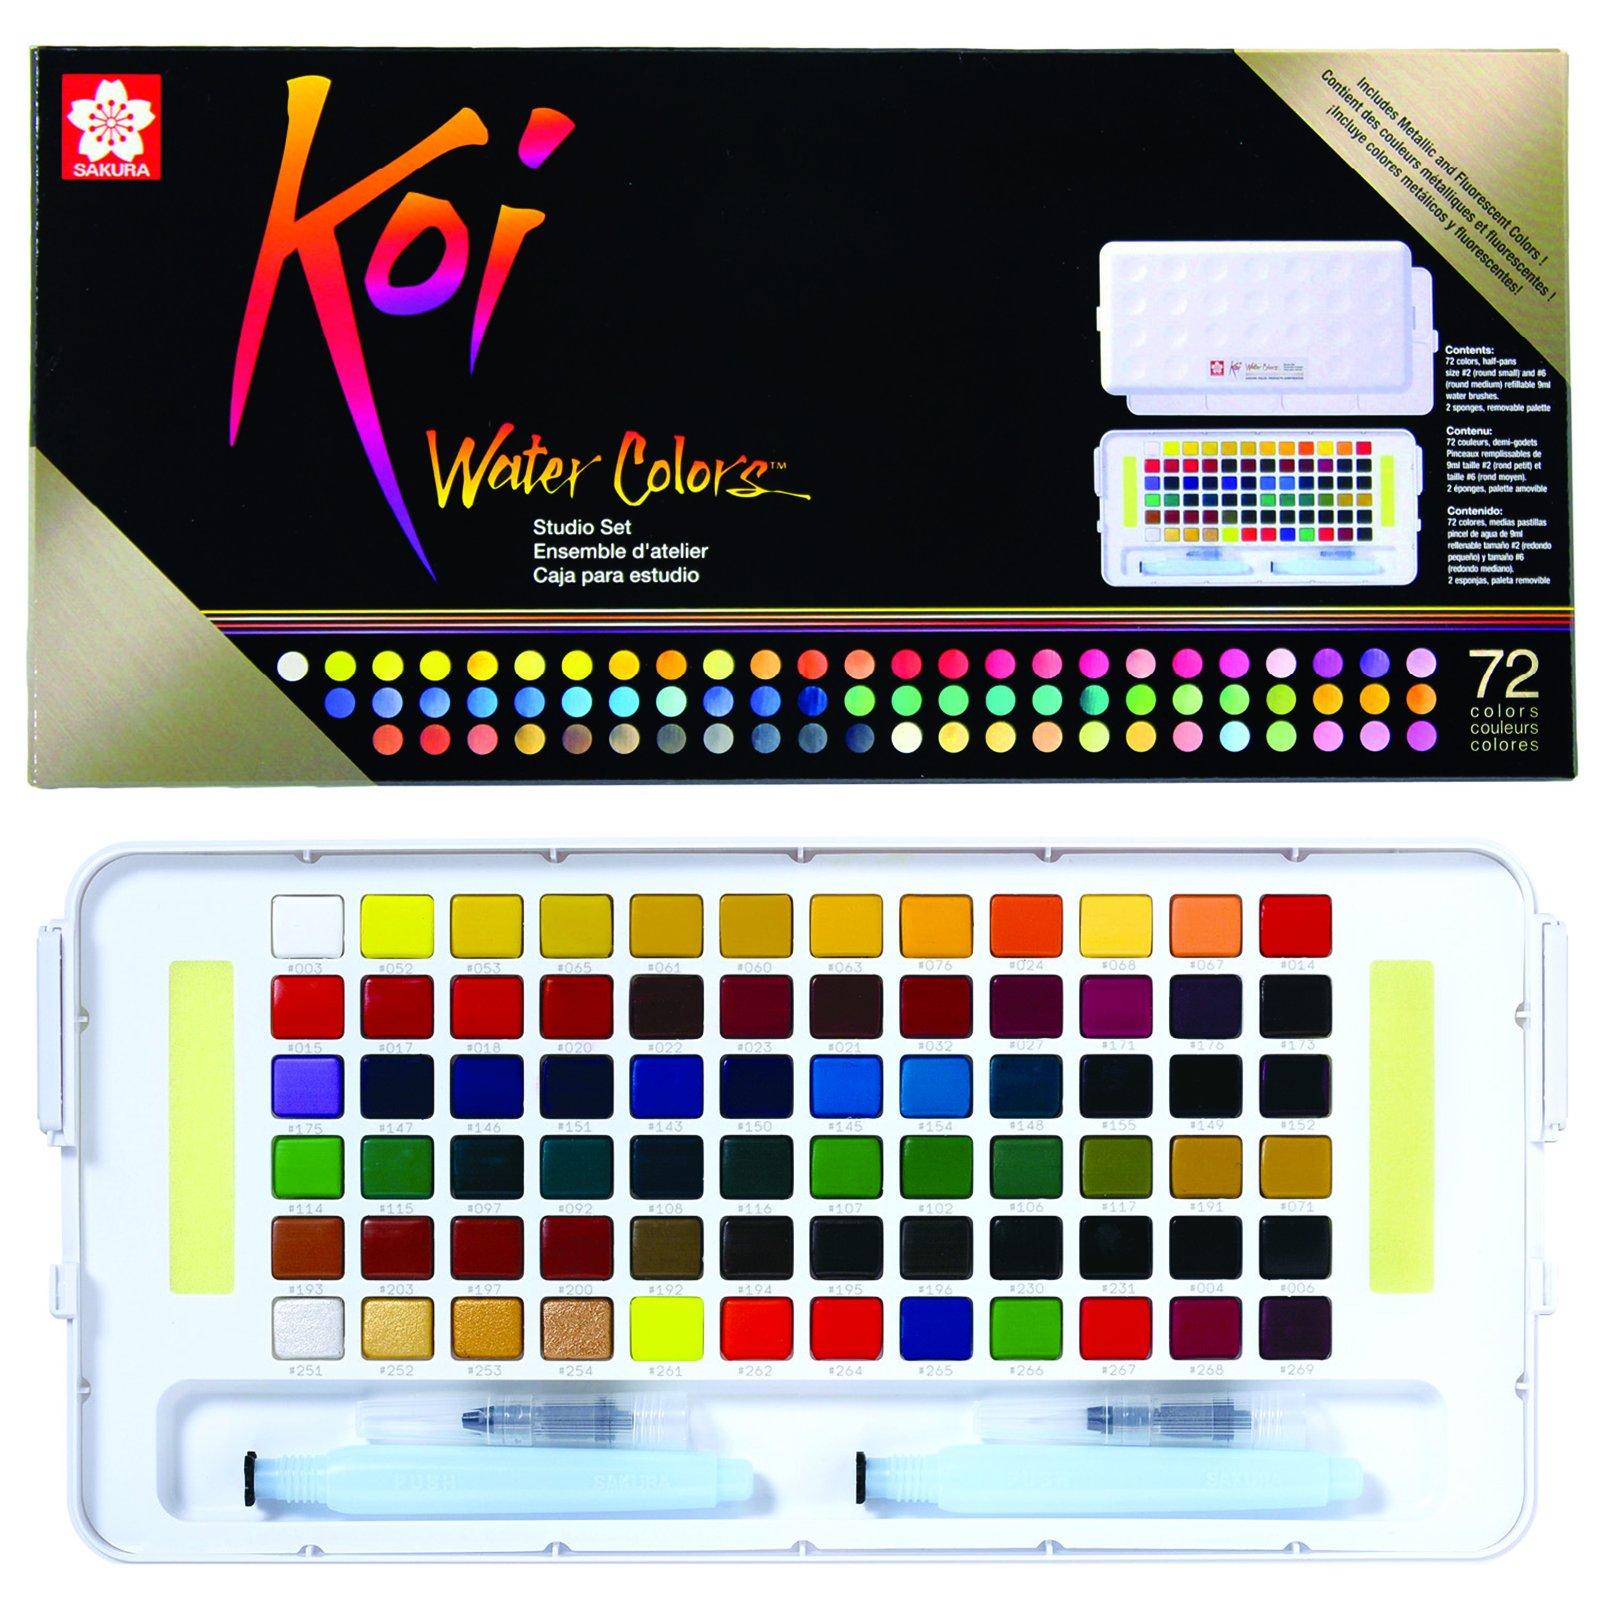 Koi Watercolors Studio Sketch Box Sets